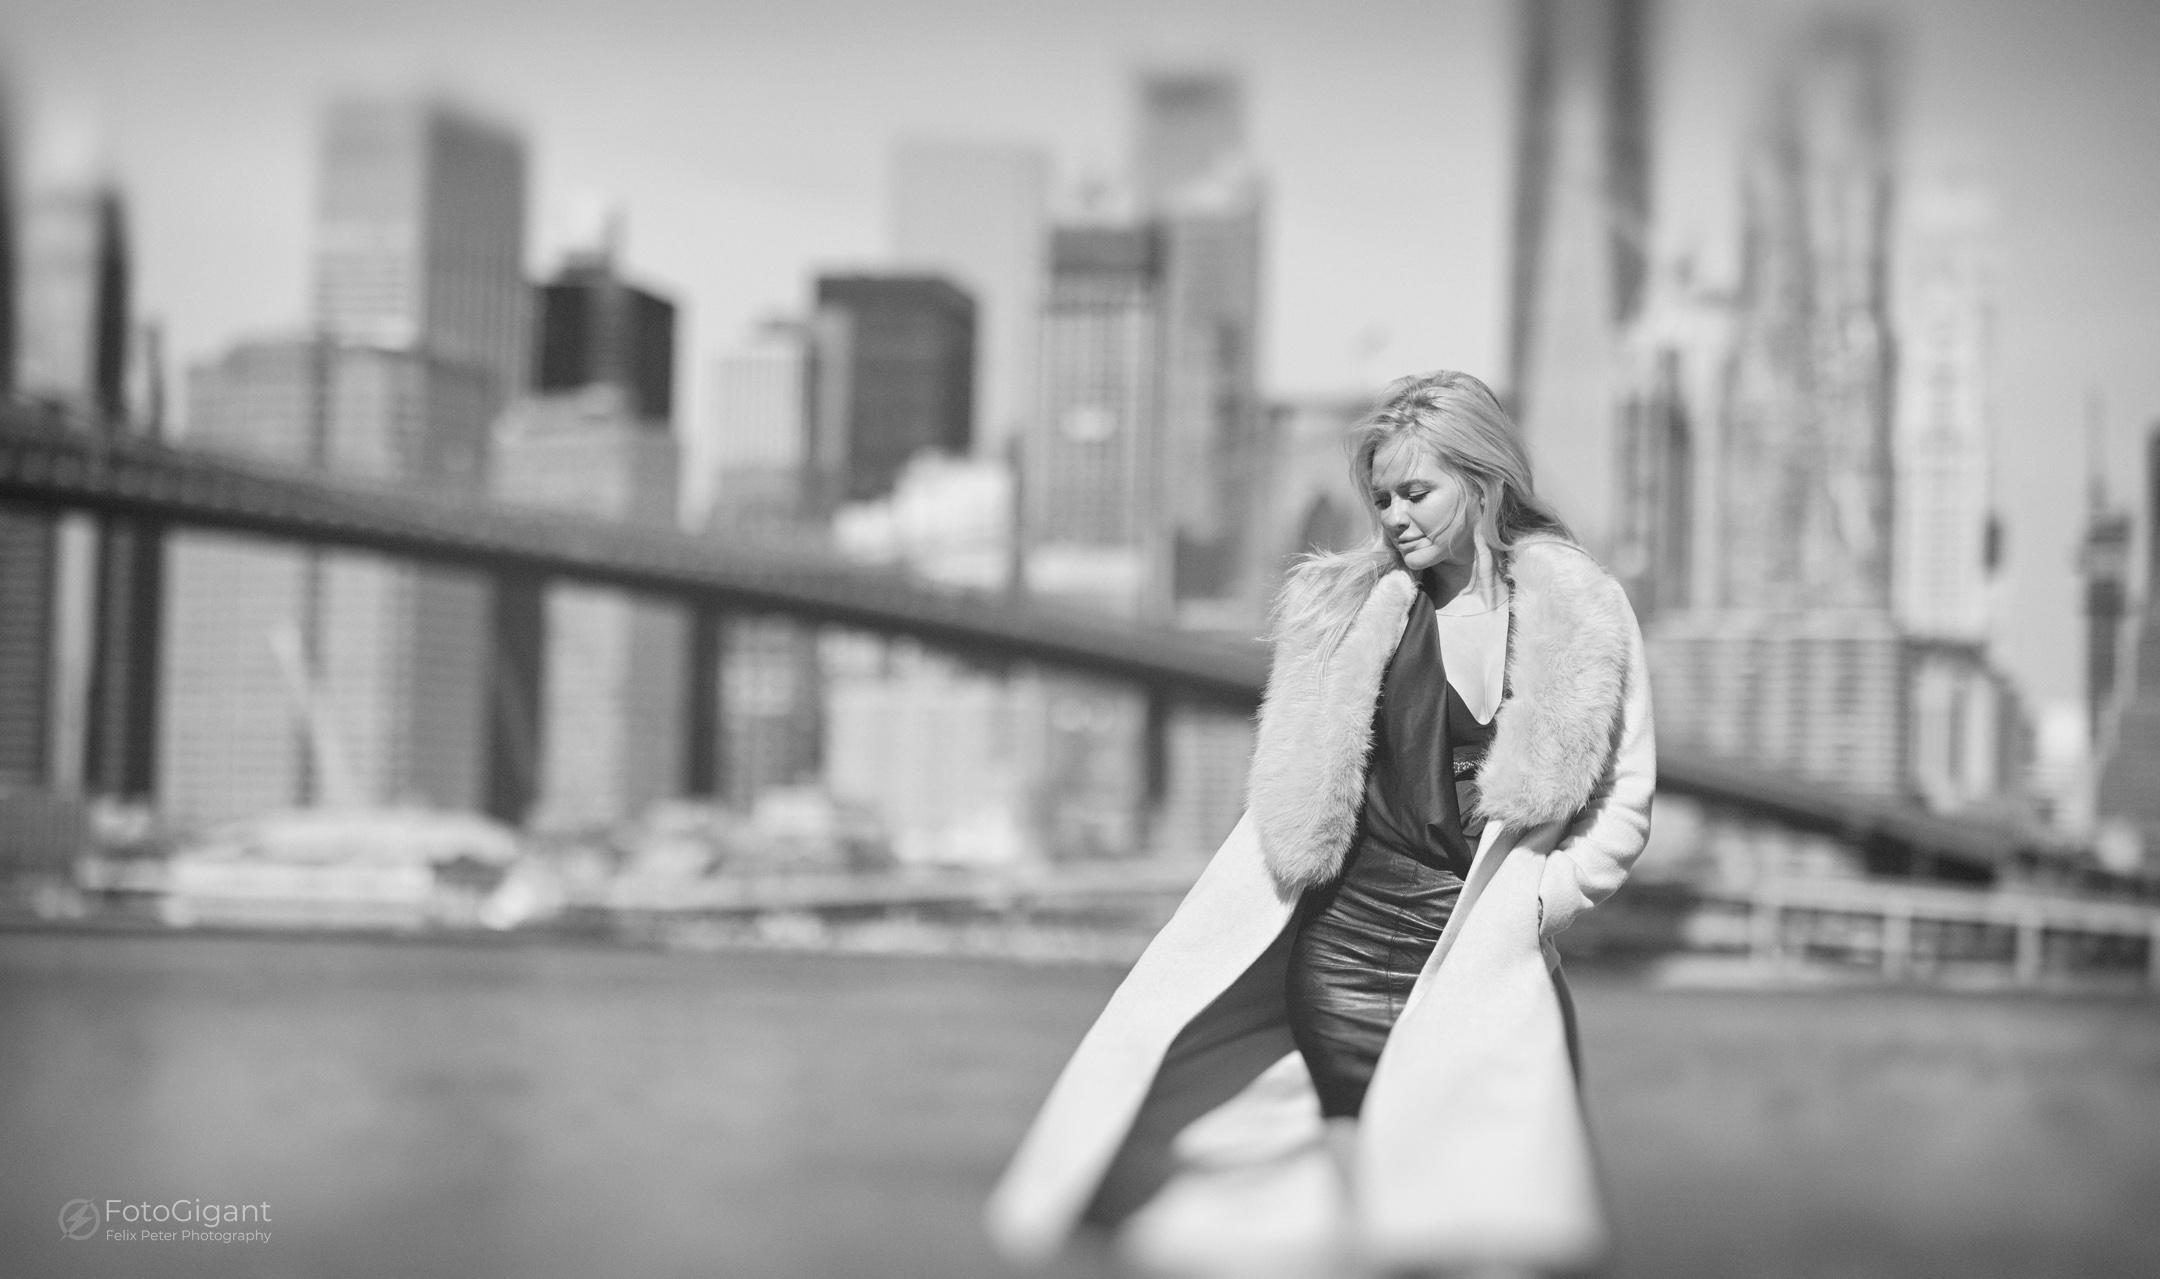 NewYork_JuliaKolomiyets_Fashionphotography_04.jpg